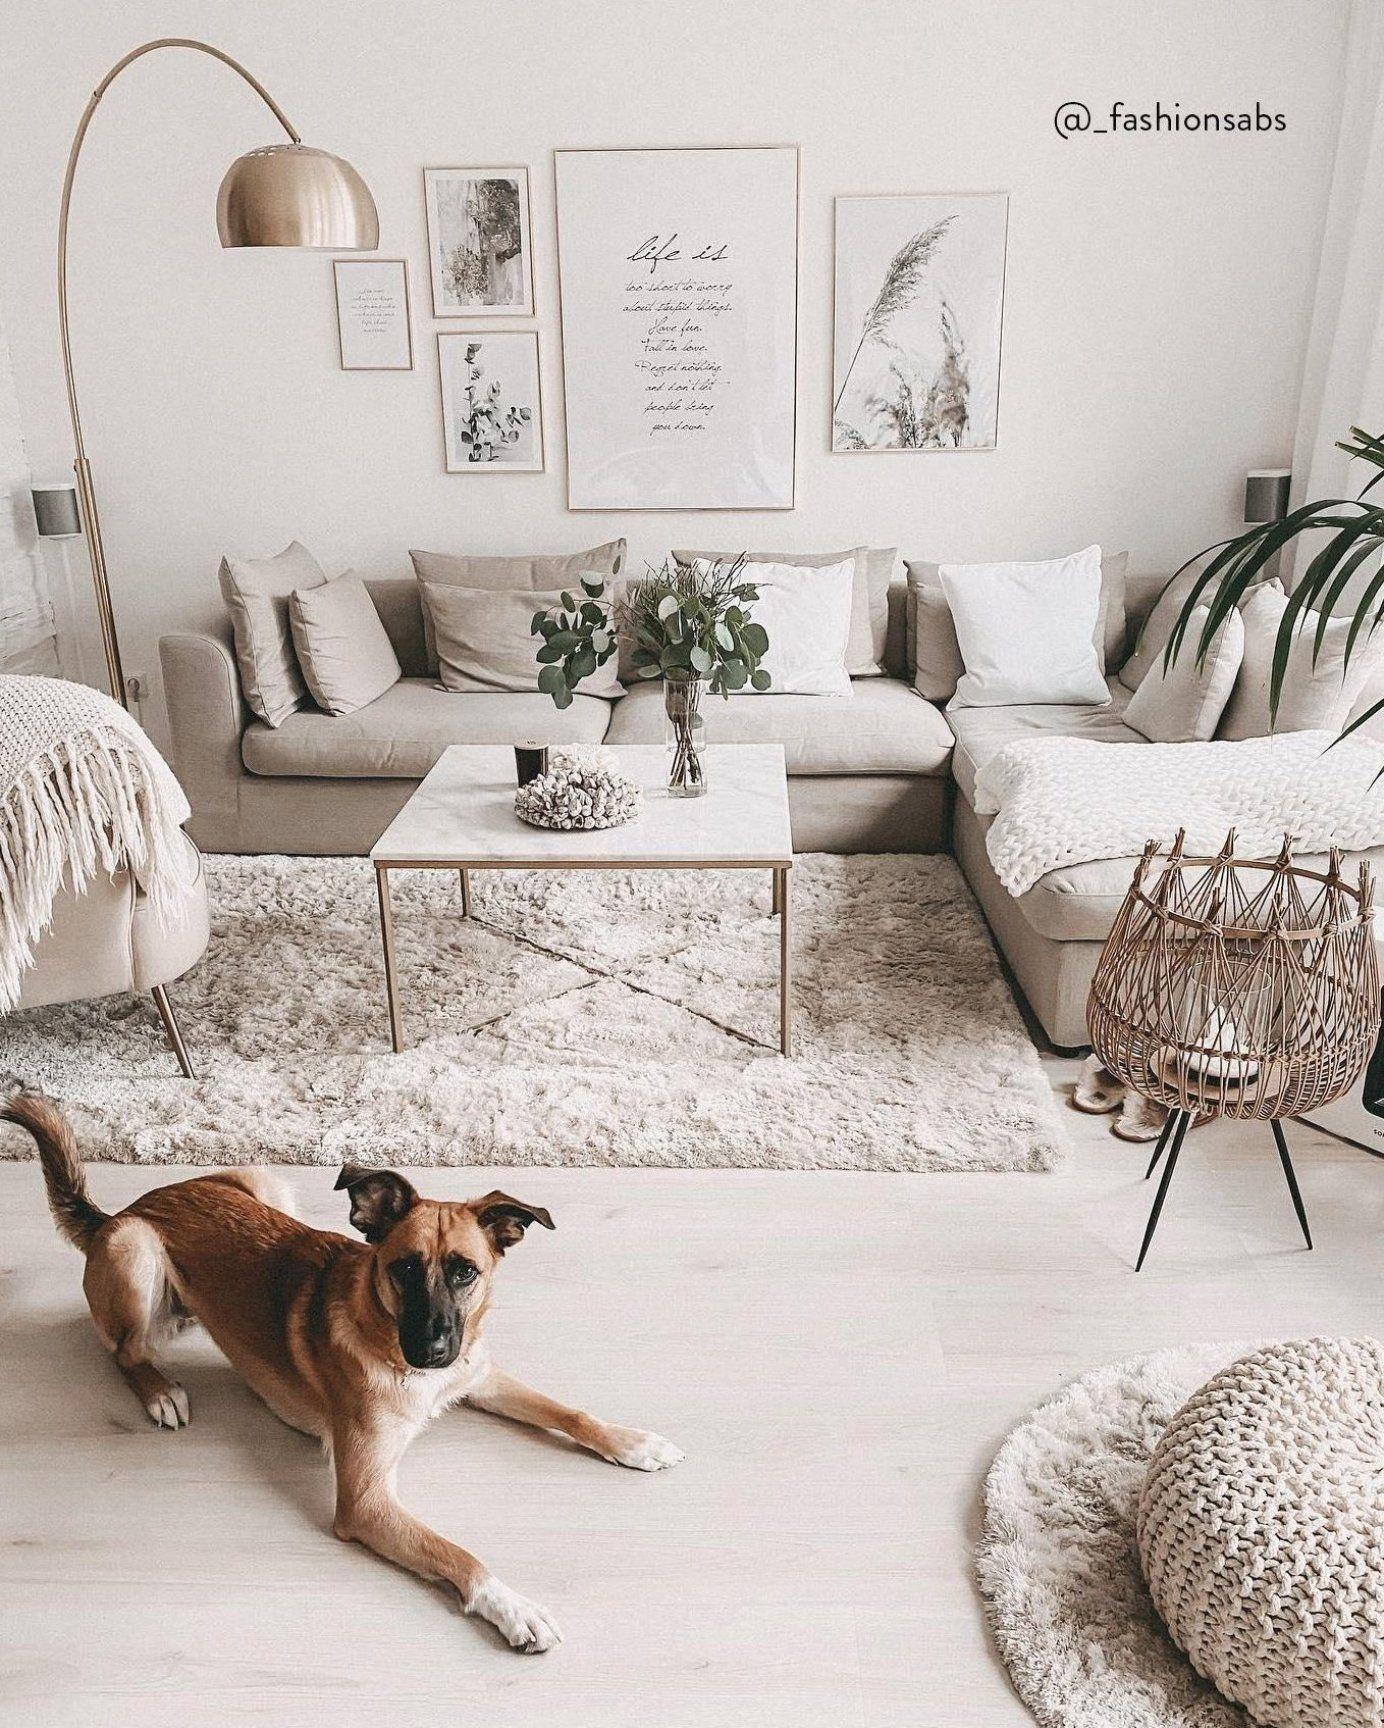 #bedroomideas #gardenhomedecor #homedecor #livingroomideas #kitchenideas